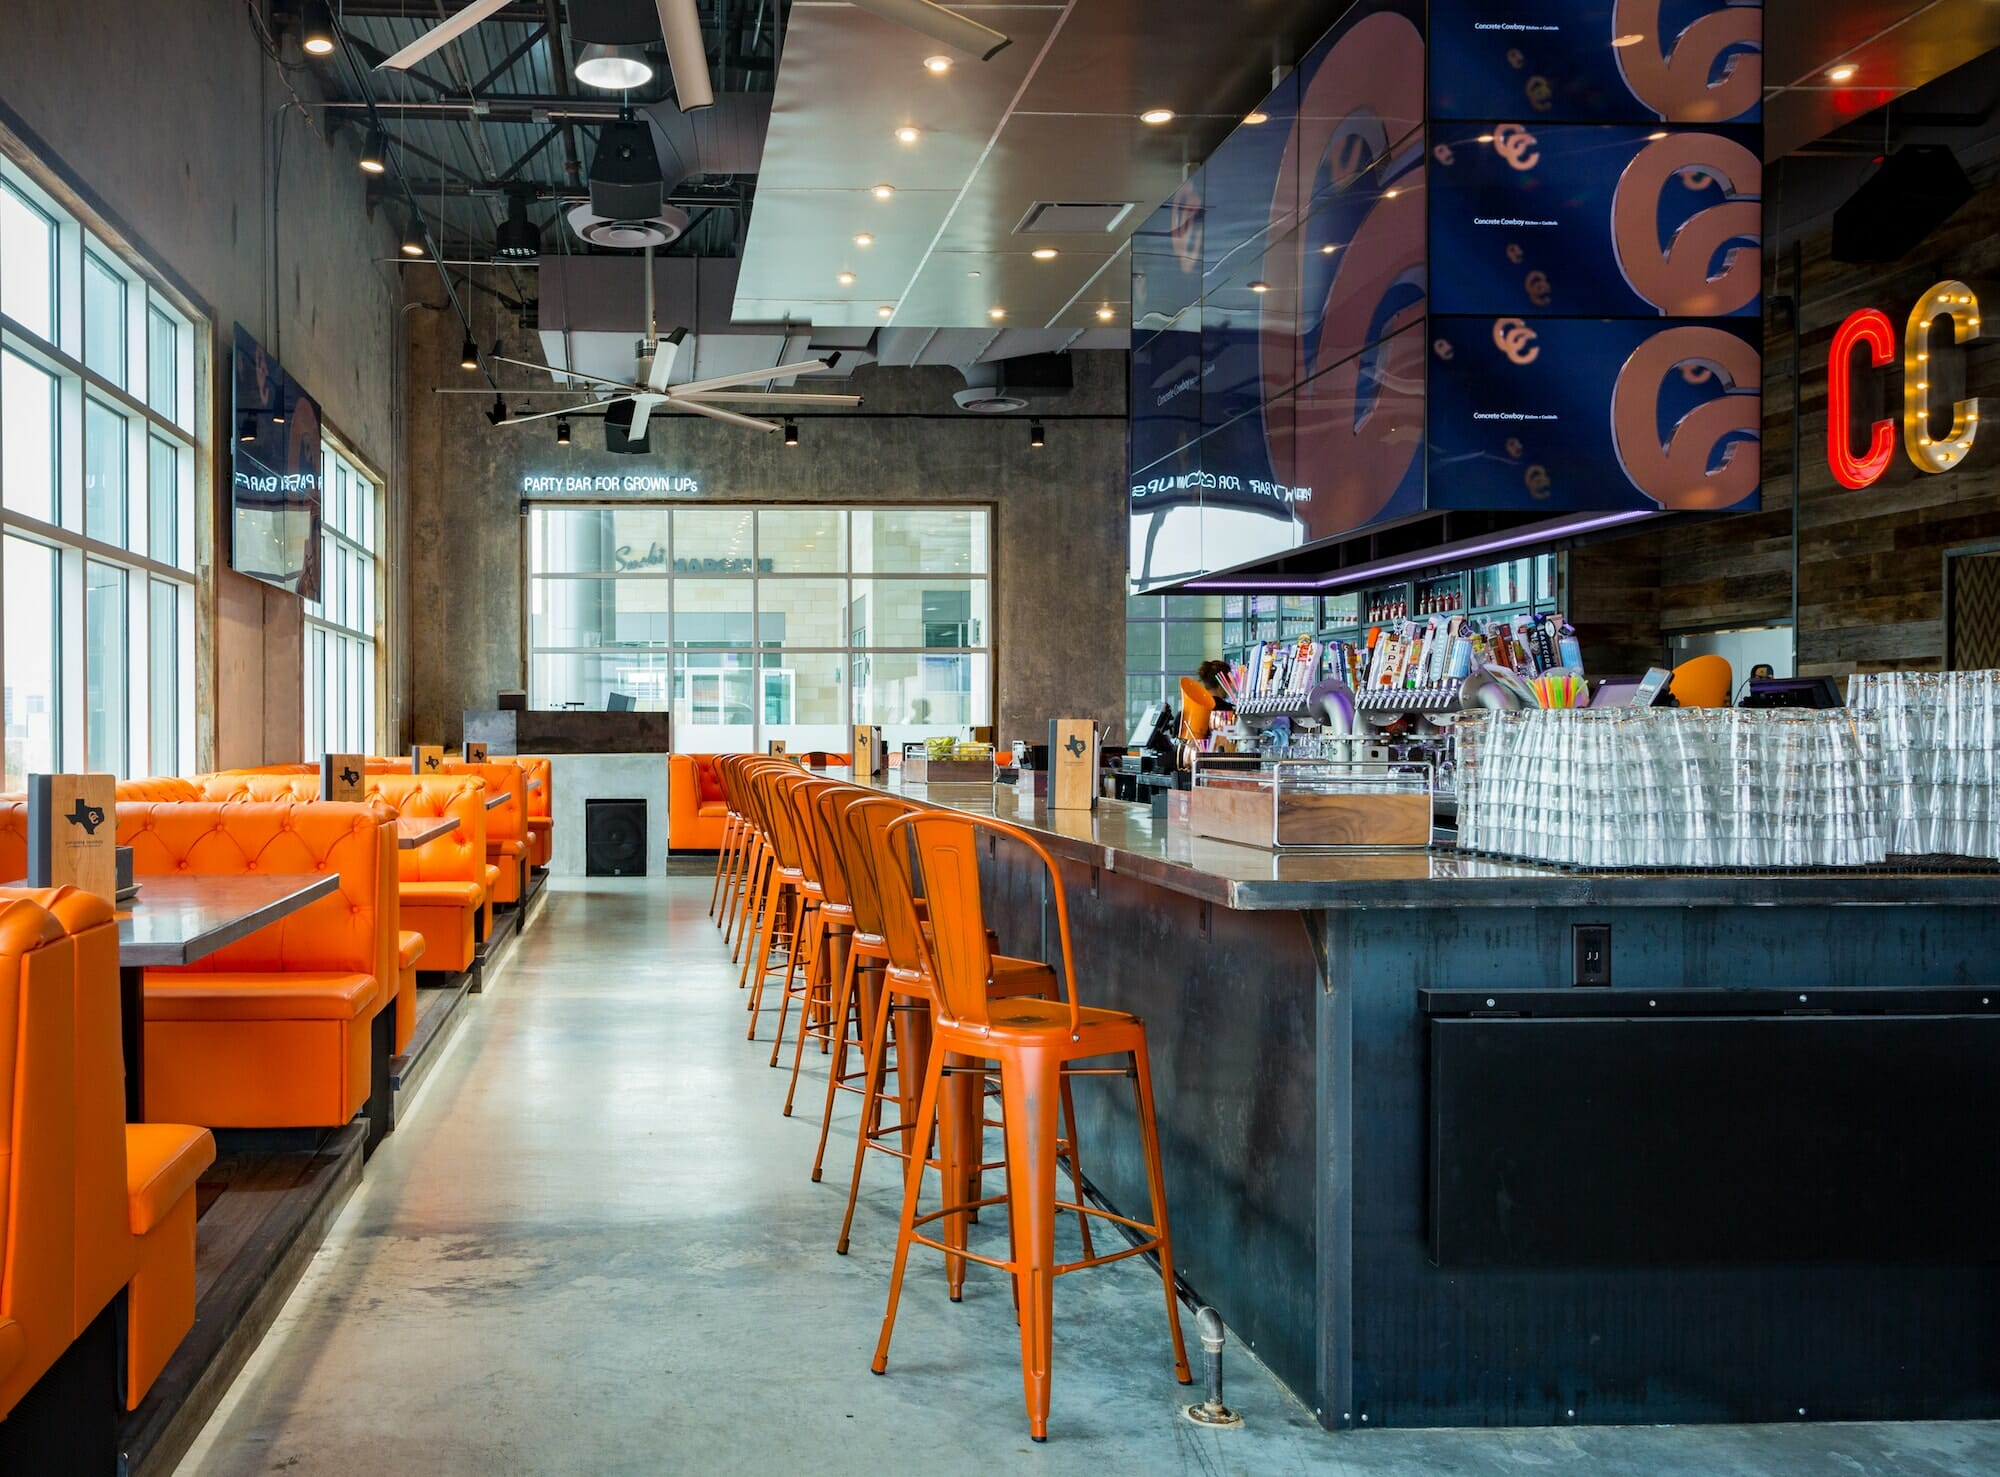 concrete-cowboy-bar-remodel-frisco-tx